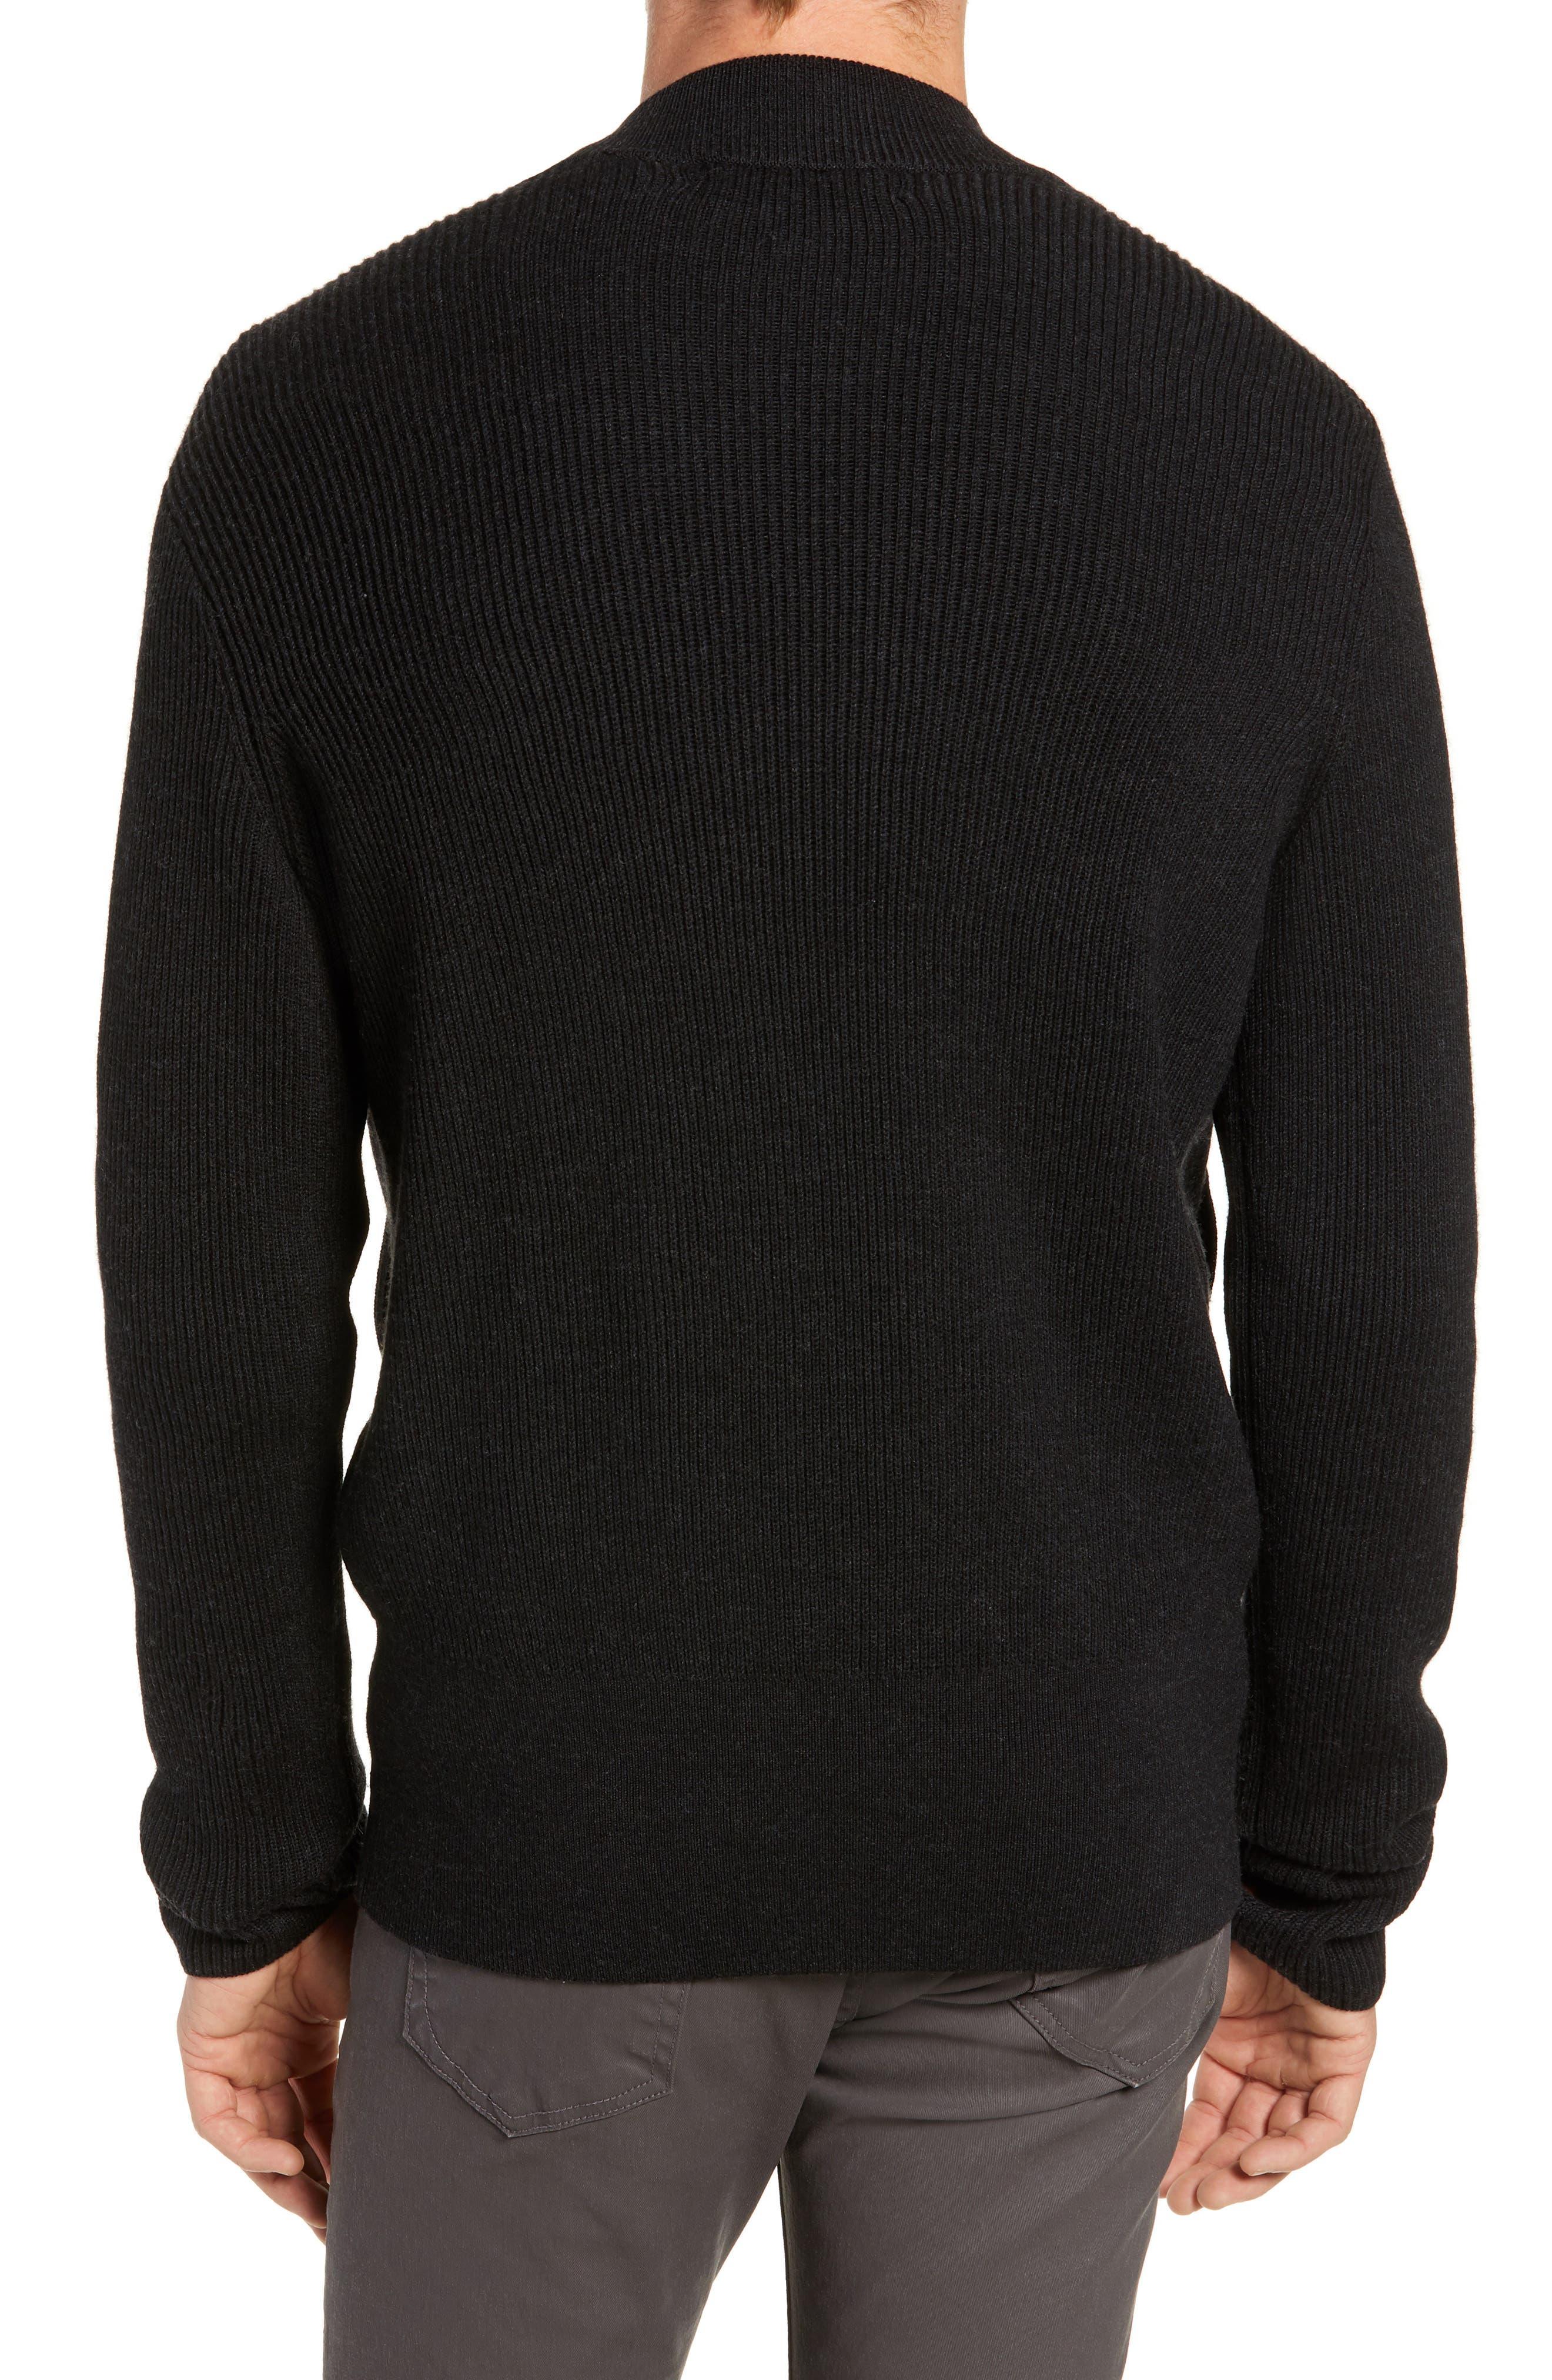 RAG & BONE, Andrew Zip Front Merino Wool Sweater, Alternate thumbnail 2, color, BLACK HEATHER